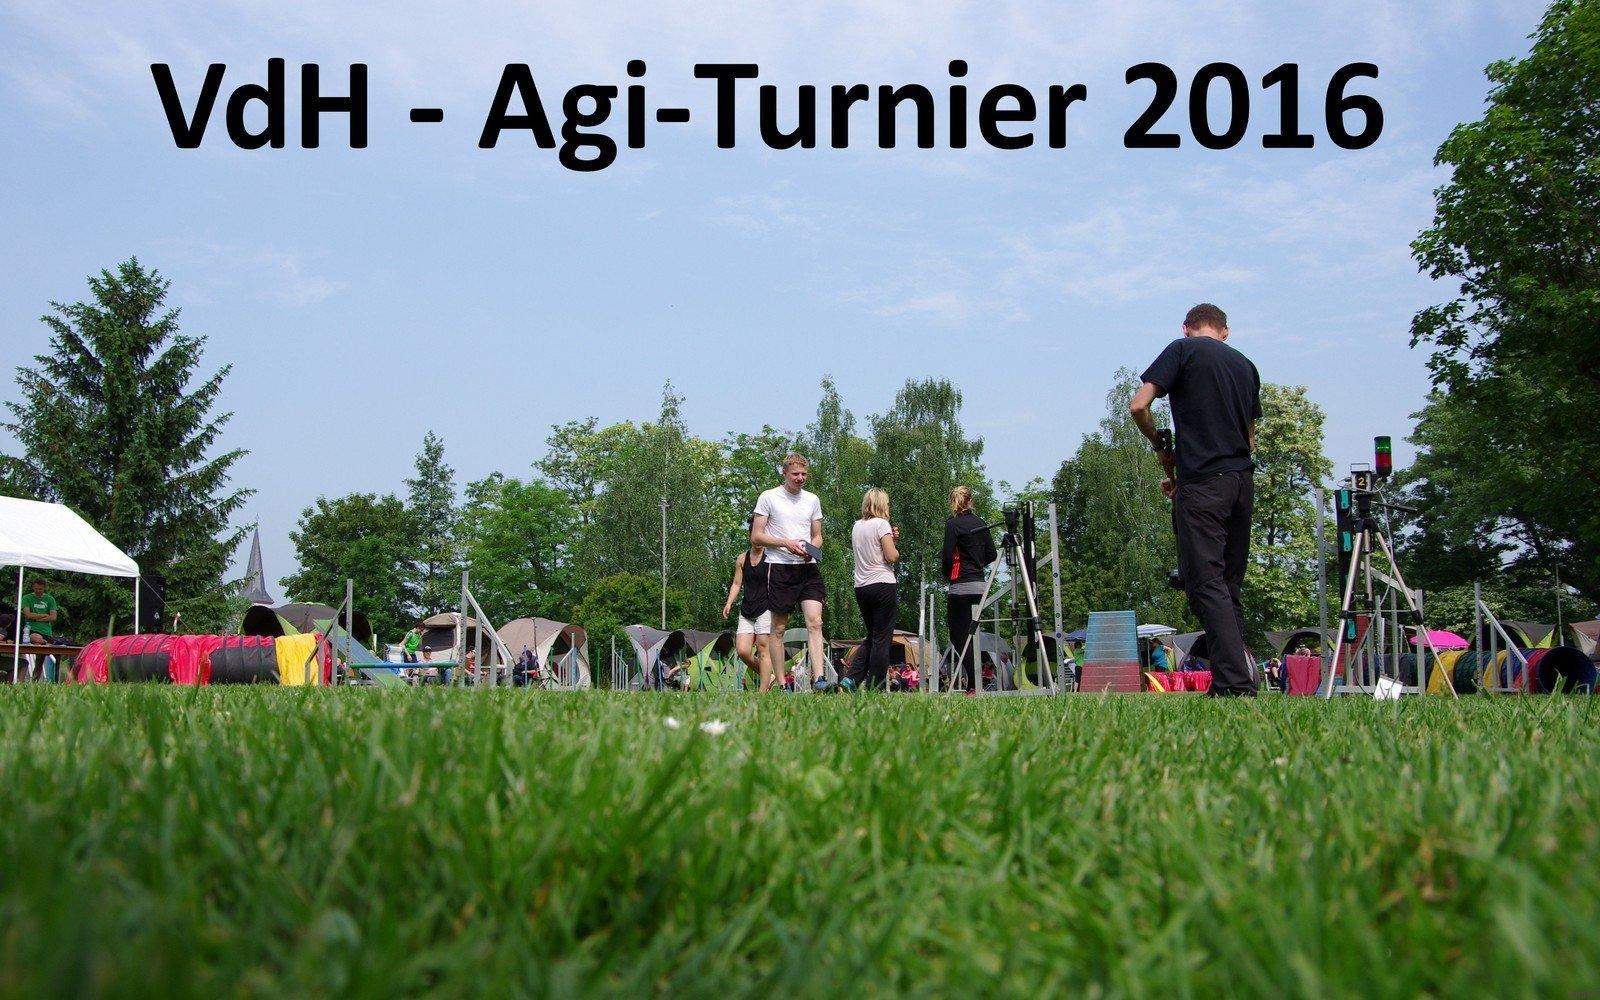 Agi Turnier 2016